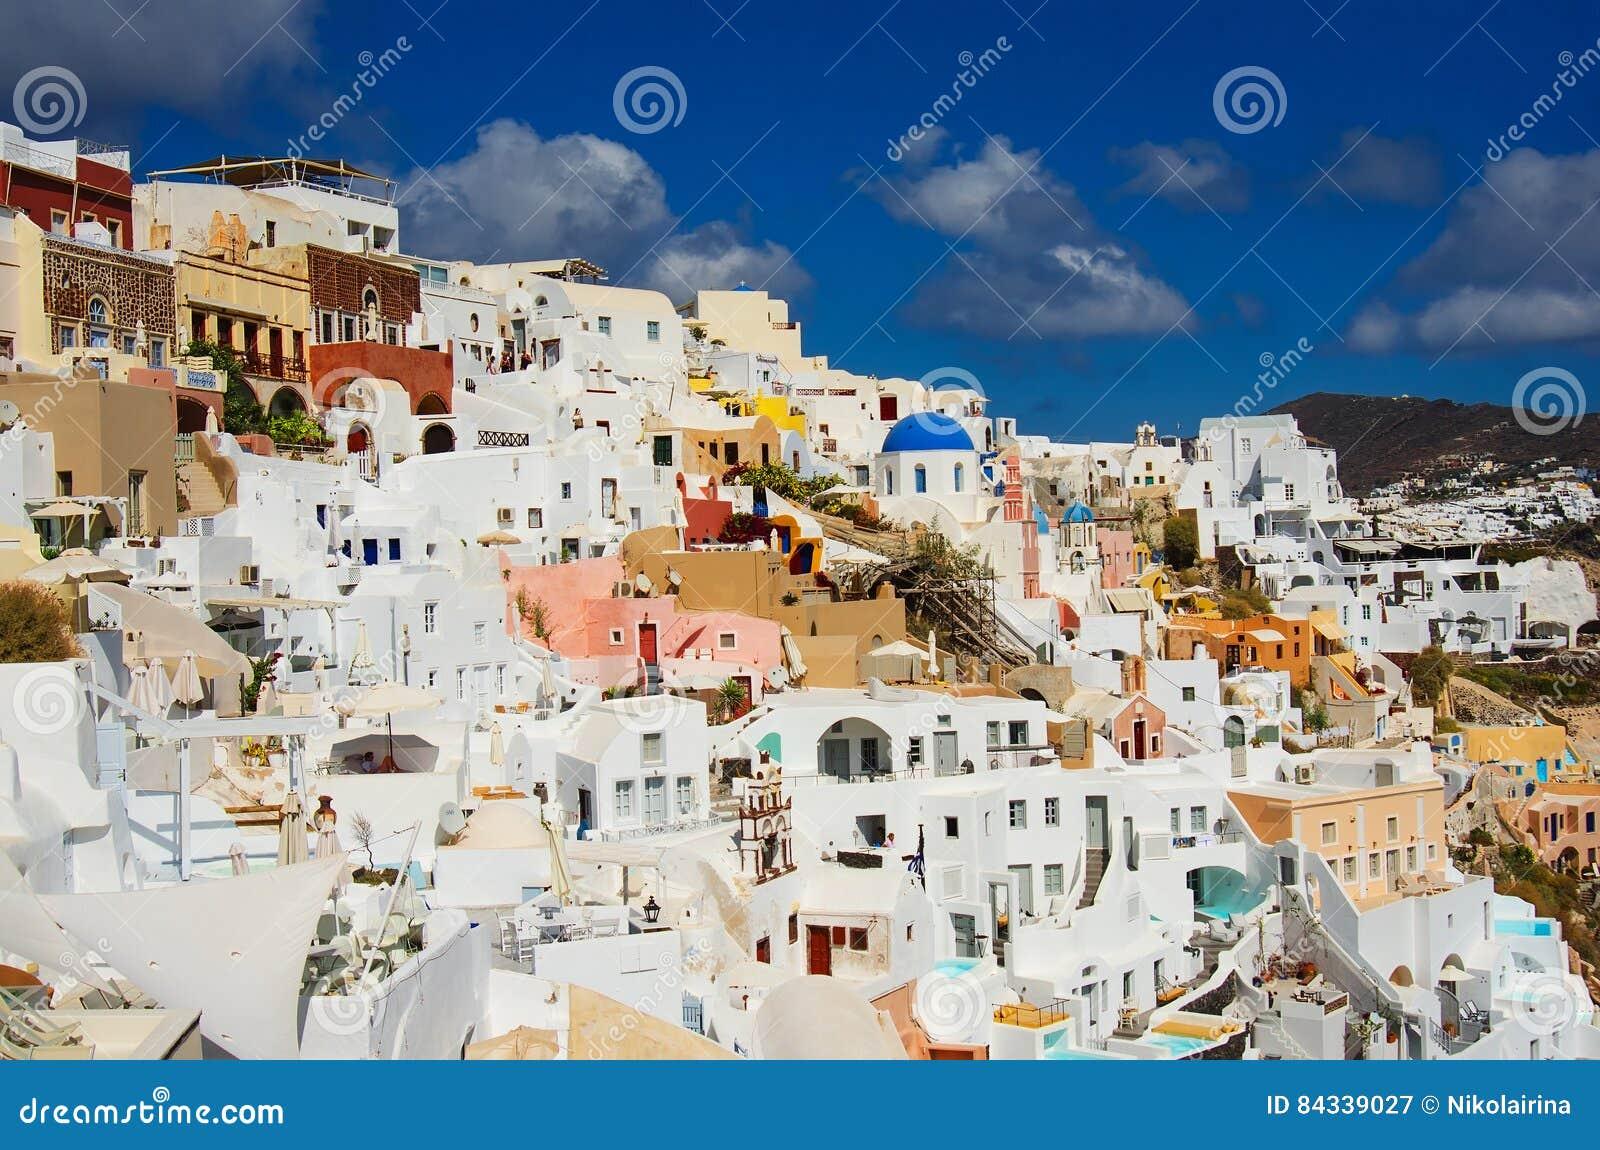 GREECE, SANTORINI, OIA TOWN